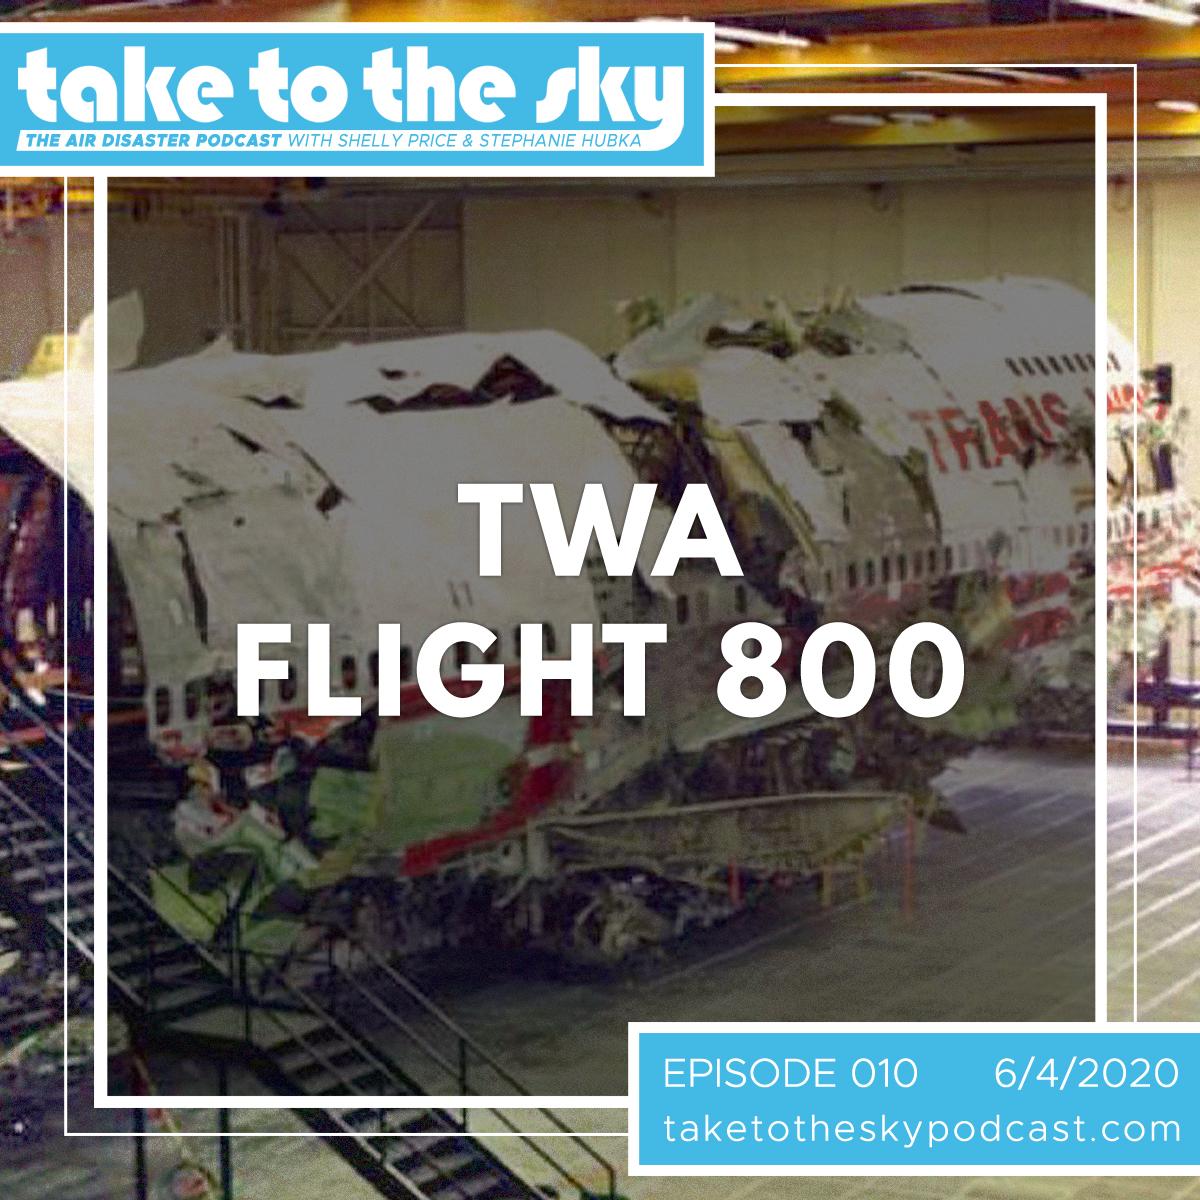 Take to the Sky Episode 010: TWA 800